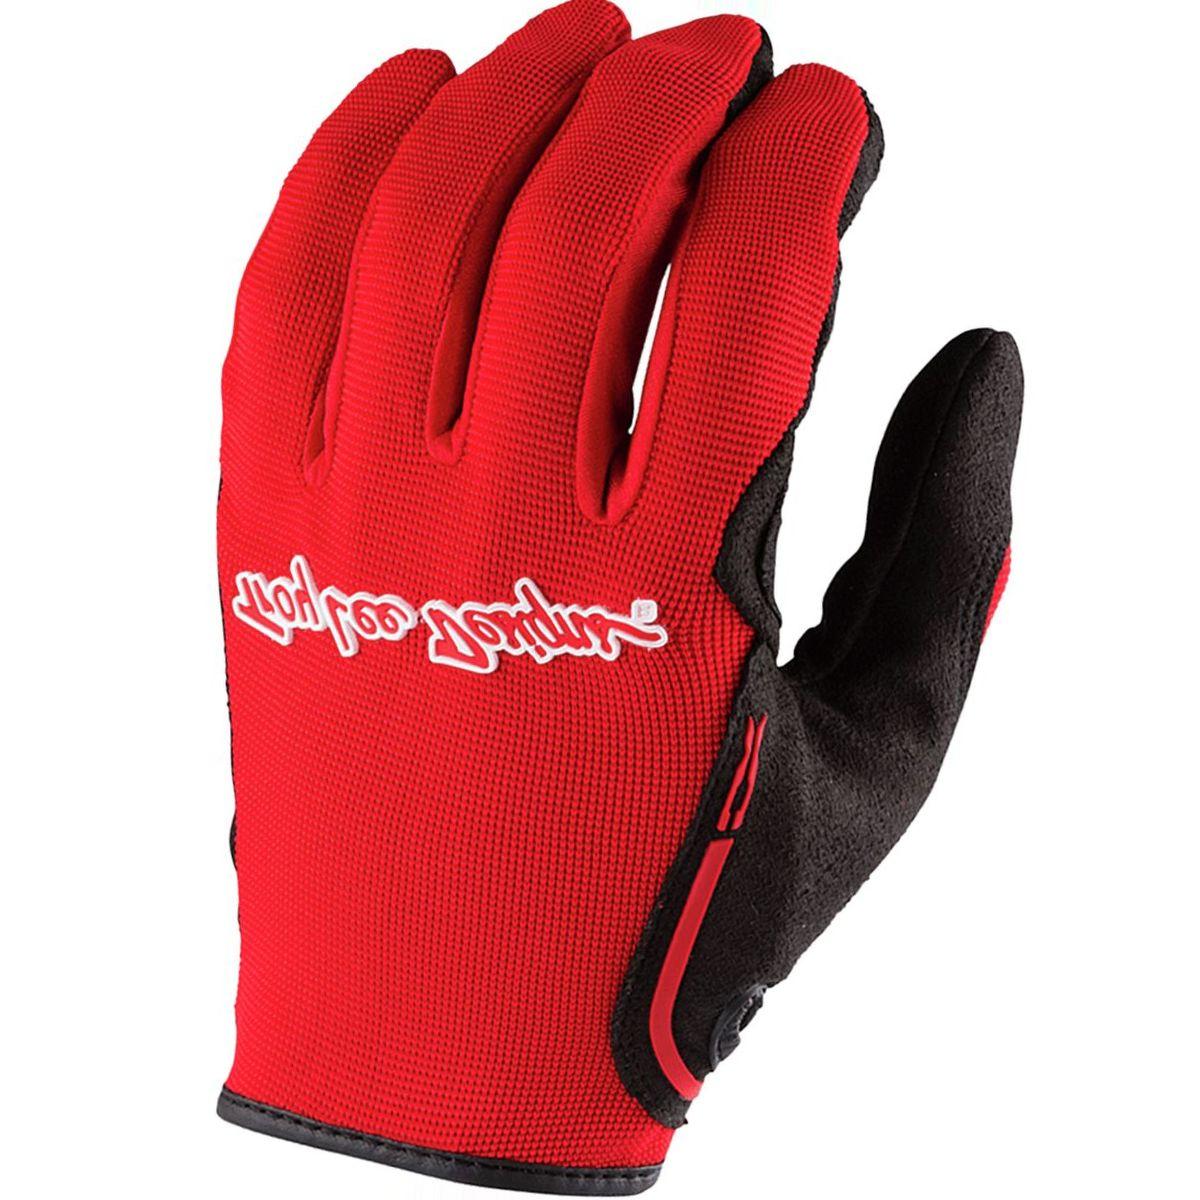 Troy Lee Designs XC Glove - Men's